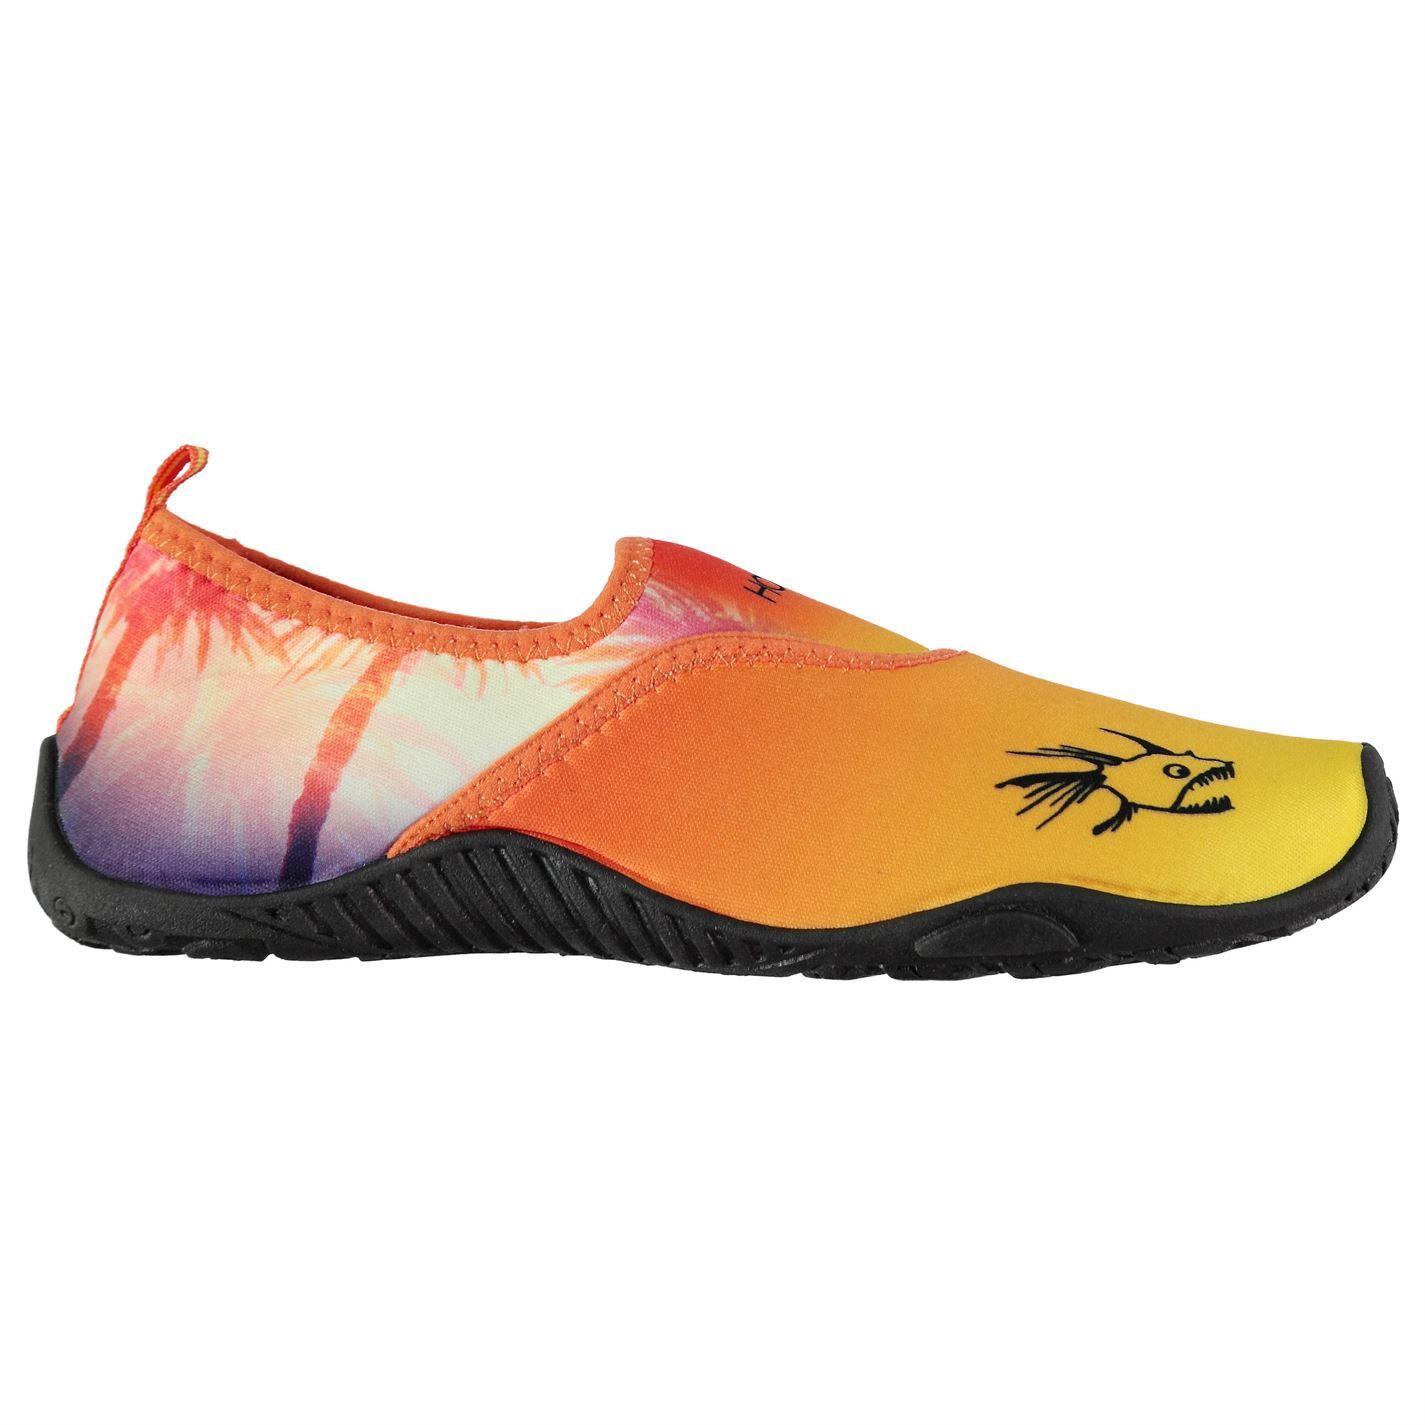 Mens Splasher Shoes